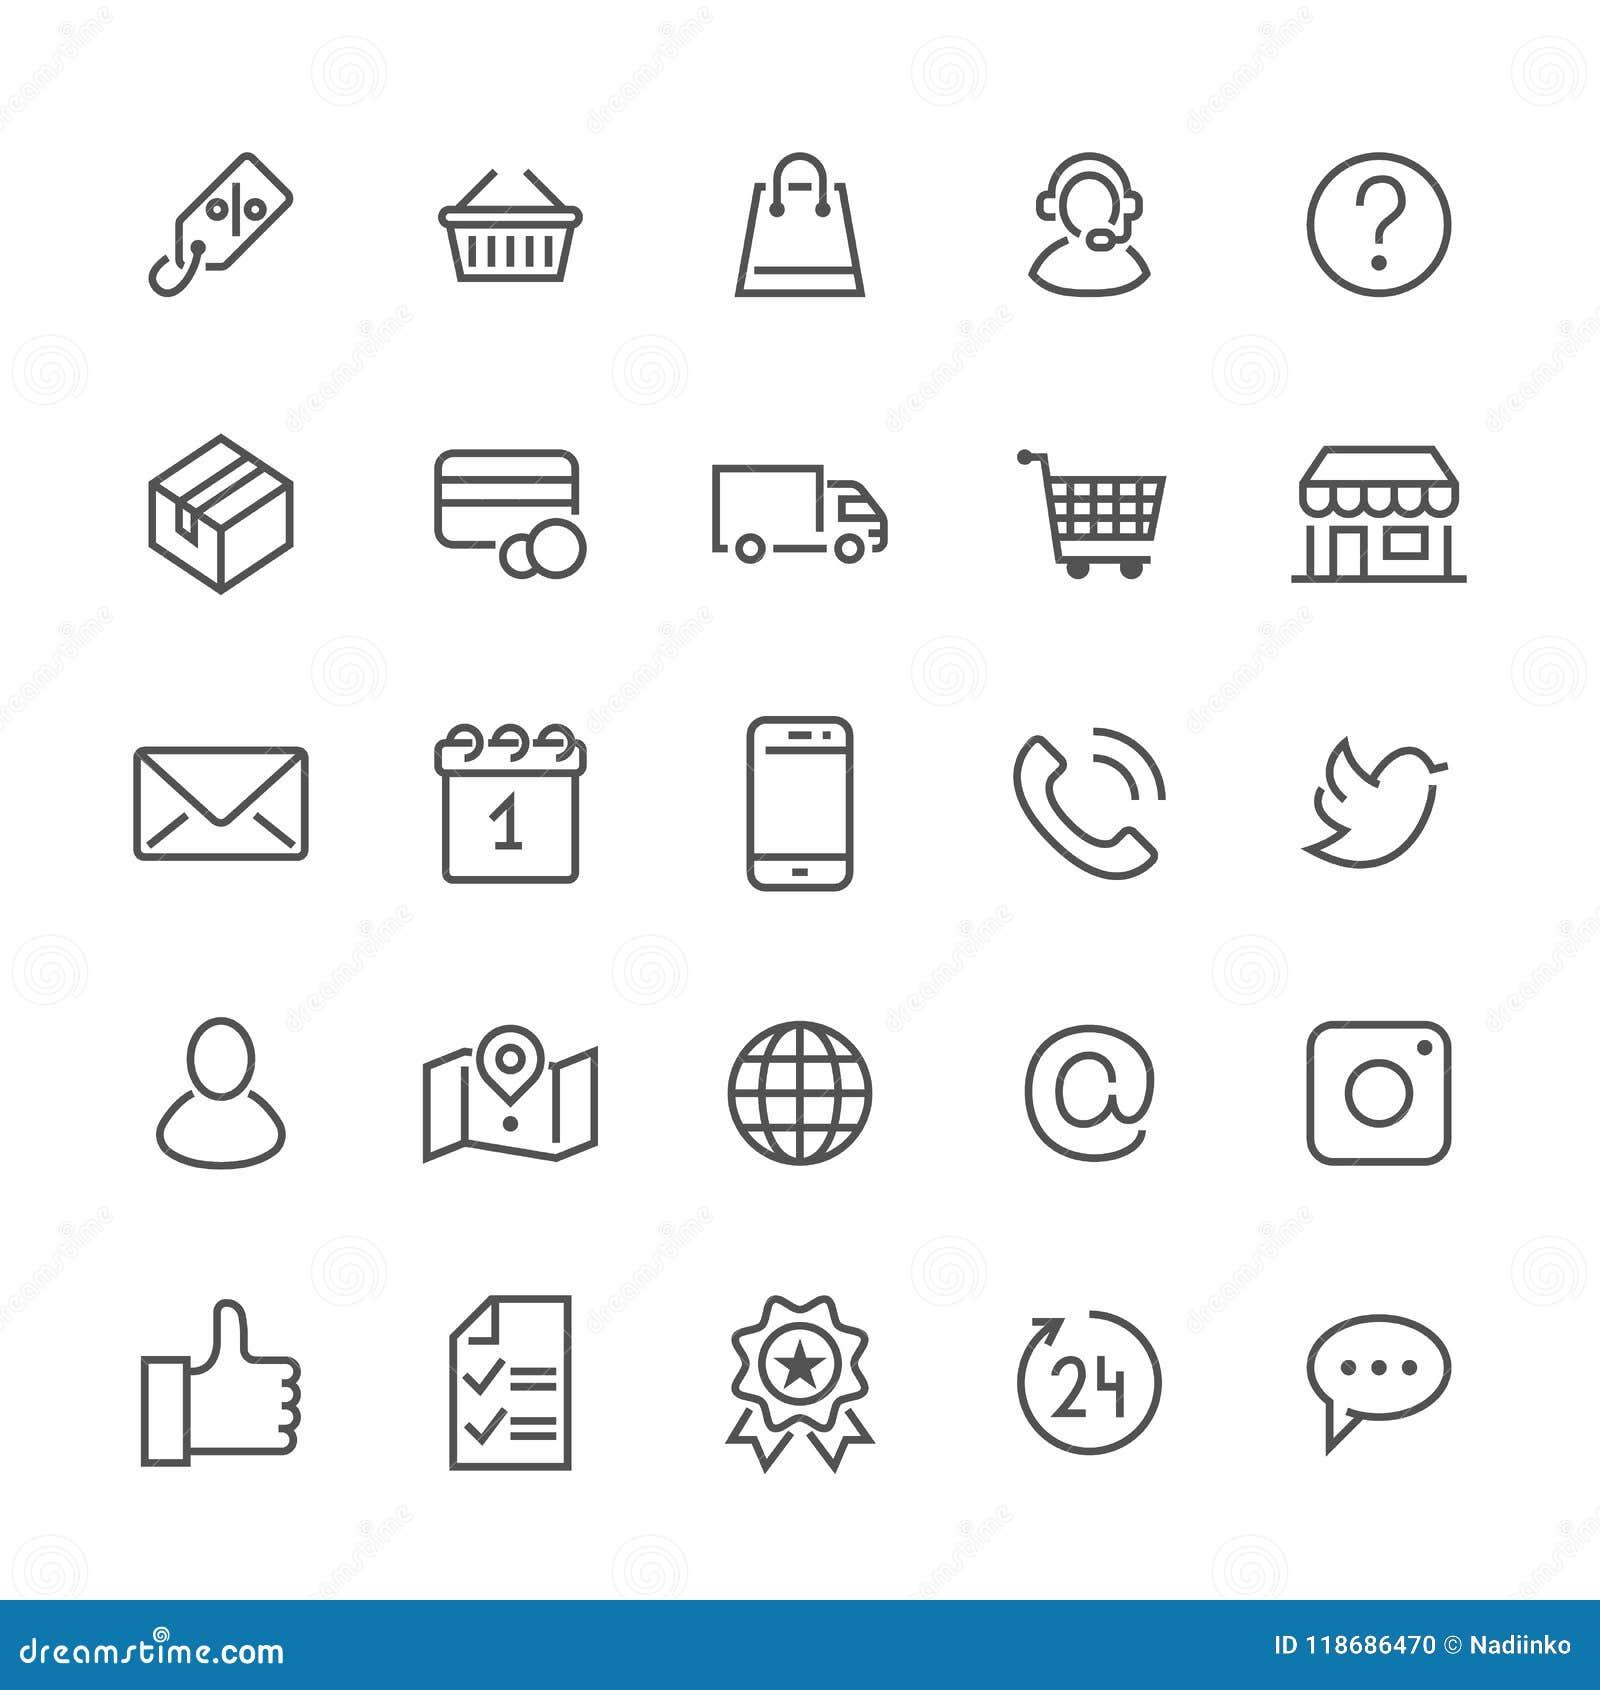 a074a78052d8 Εικονίδια γραμμών on-line αγορών επίπεδα Επιχείρηση ηλεκτρονικού εμπορίου